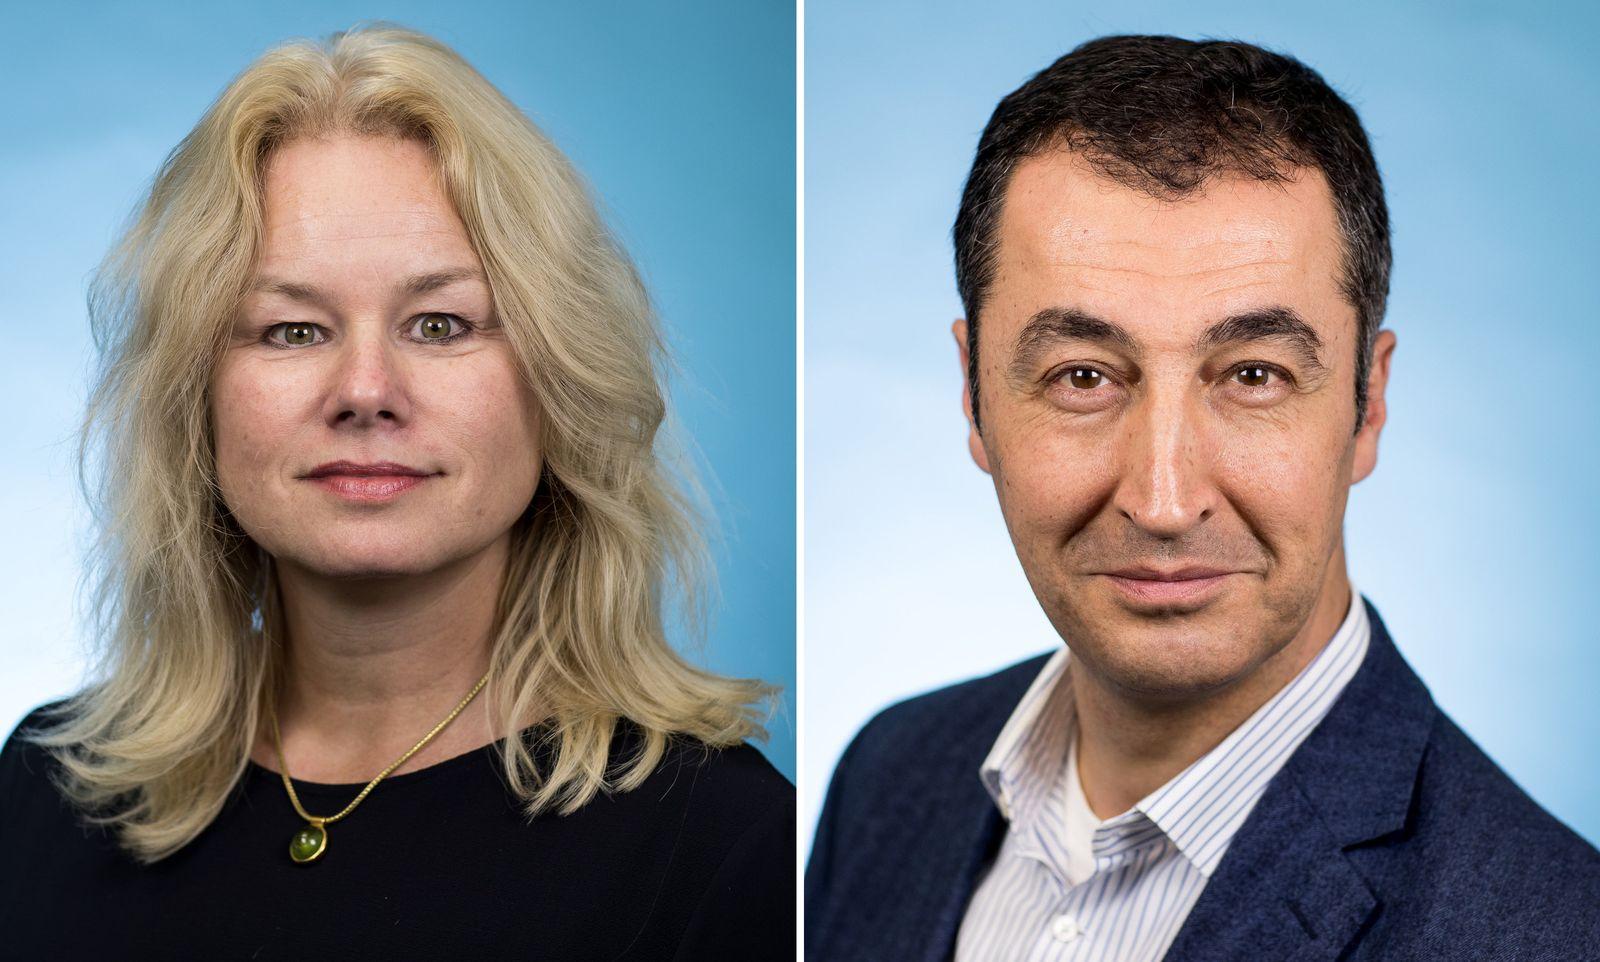 Özdemir und Kappert-Gonthe wollen den Grünen-Vorsitz